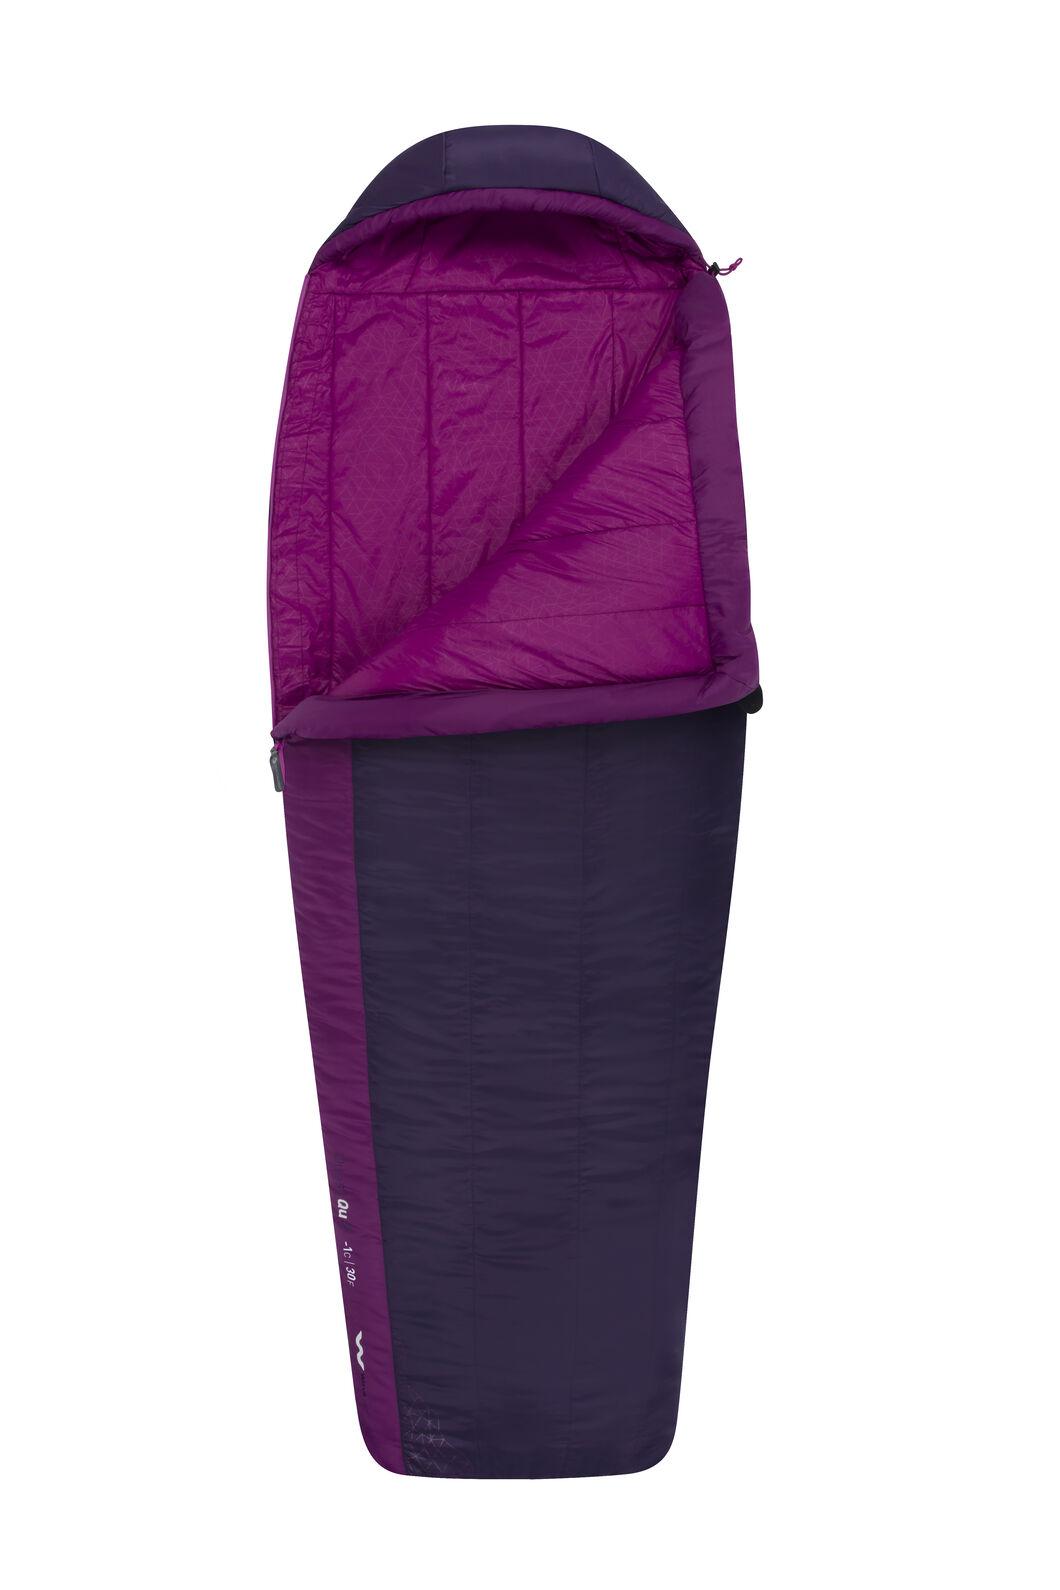 Sea to Summit Quest II Sleeping Bag - Women's Long, Purple, hi-res